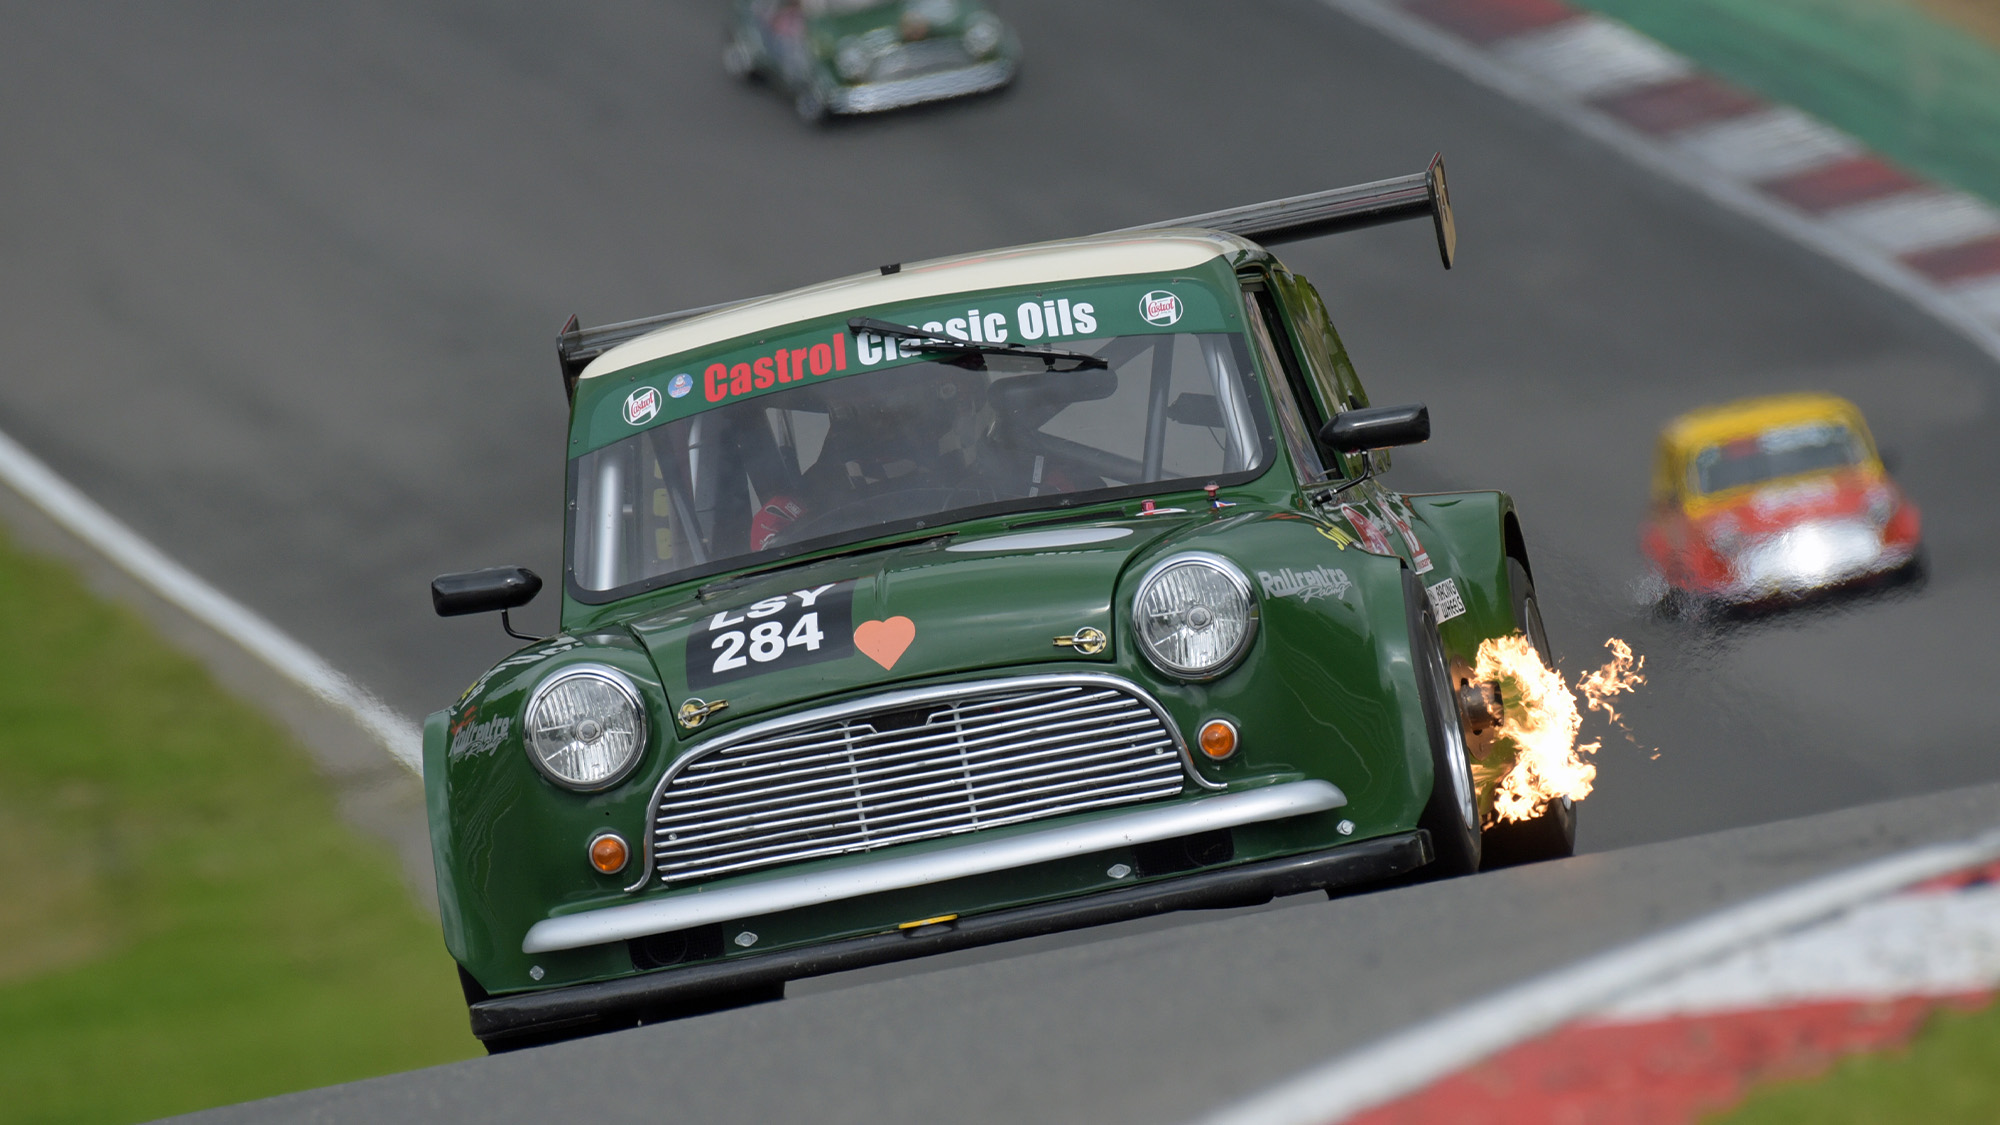 Racing Mini spitting flames